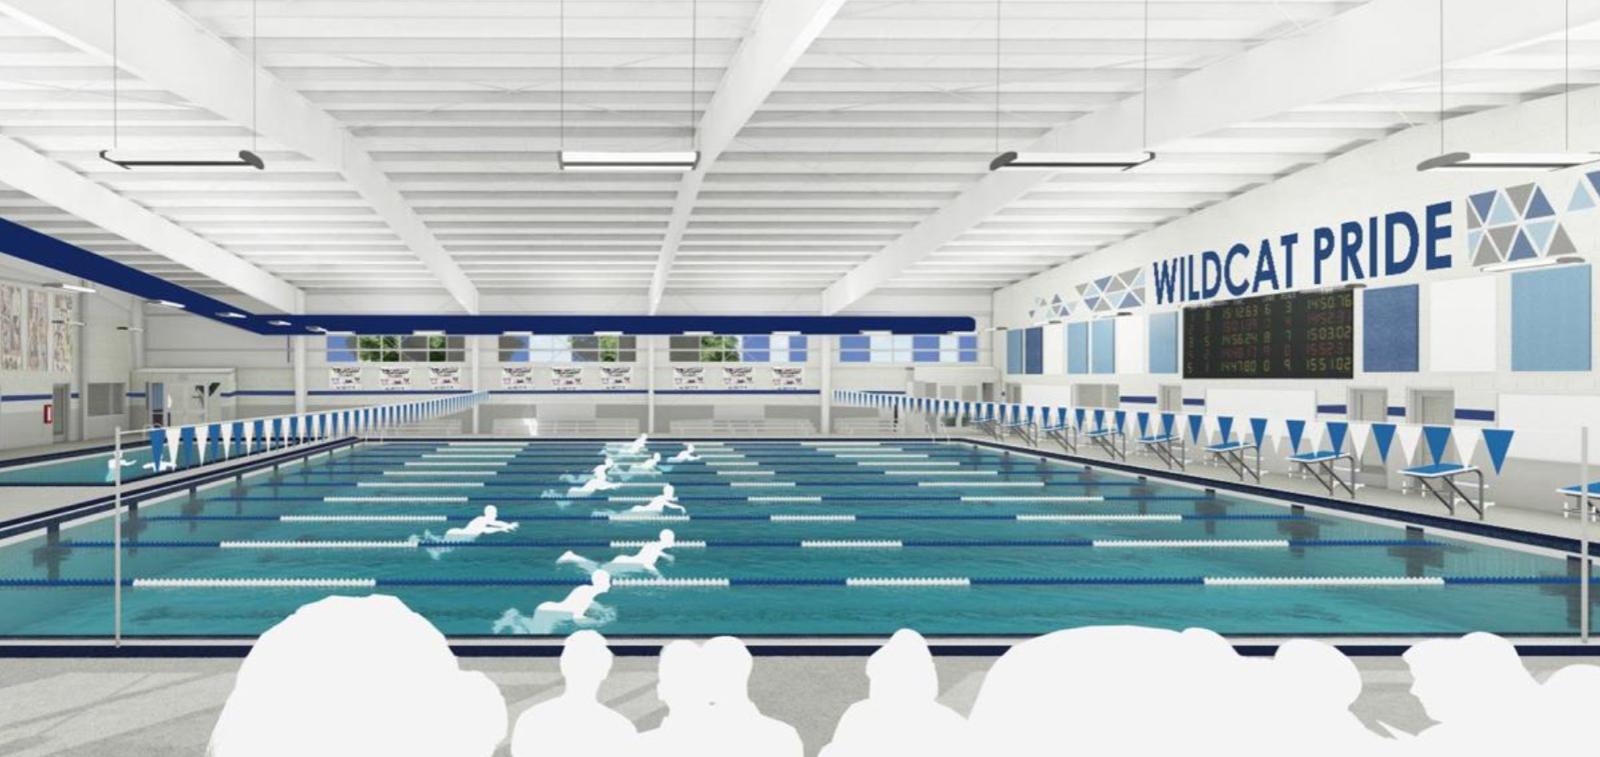 TISD board approves $5.4 million swim center renovation